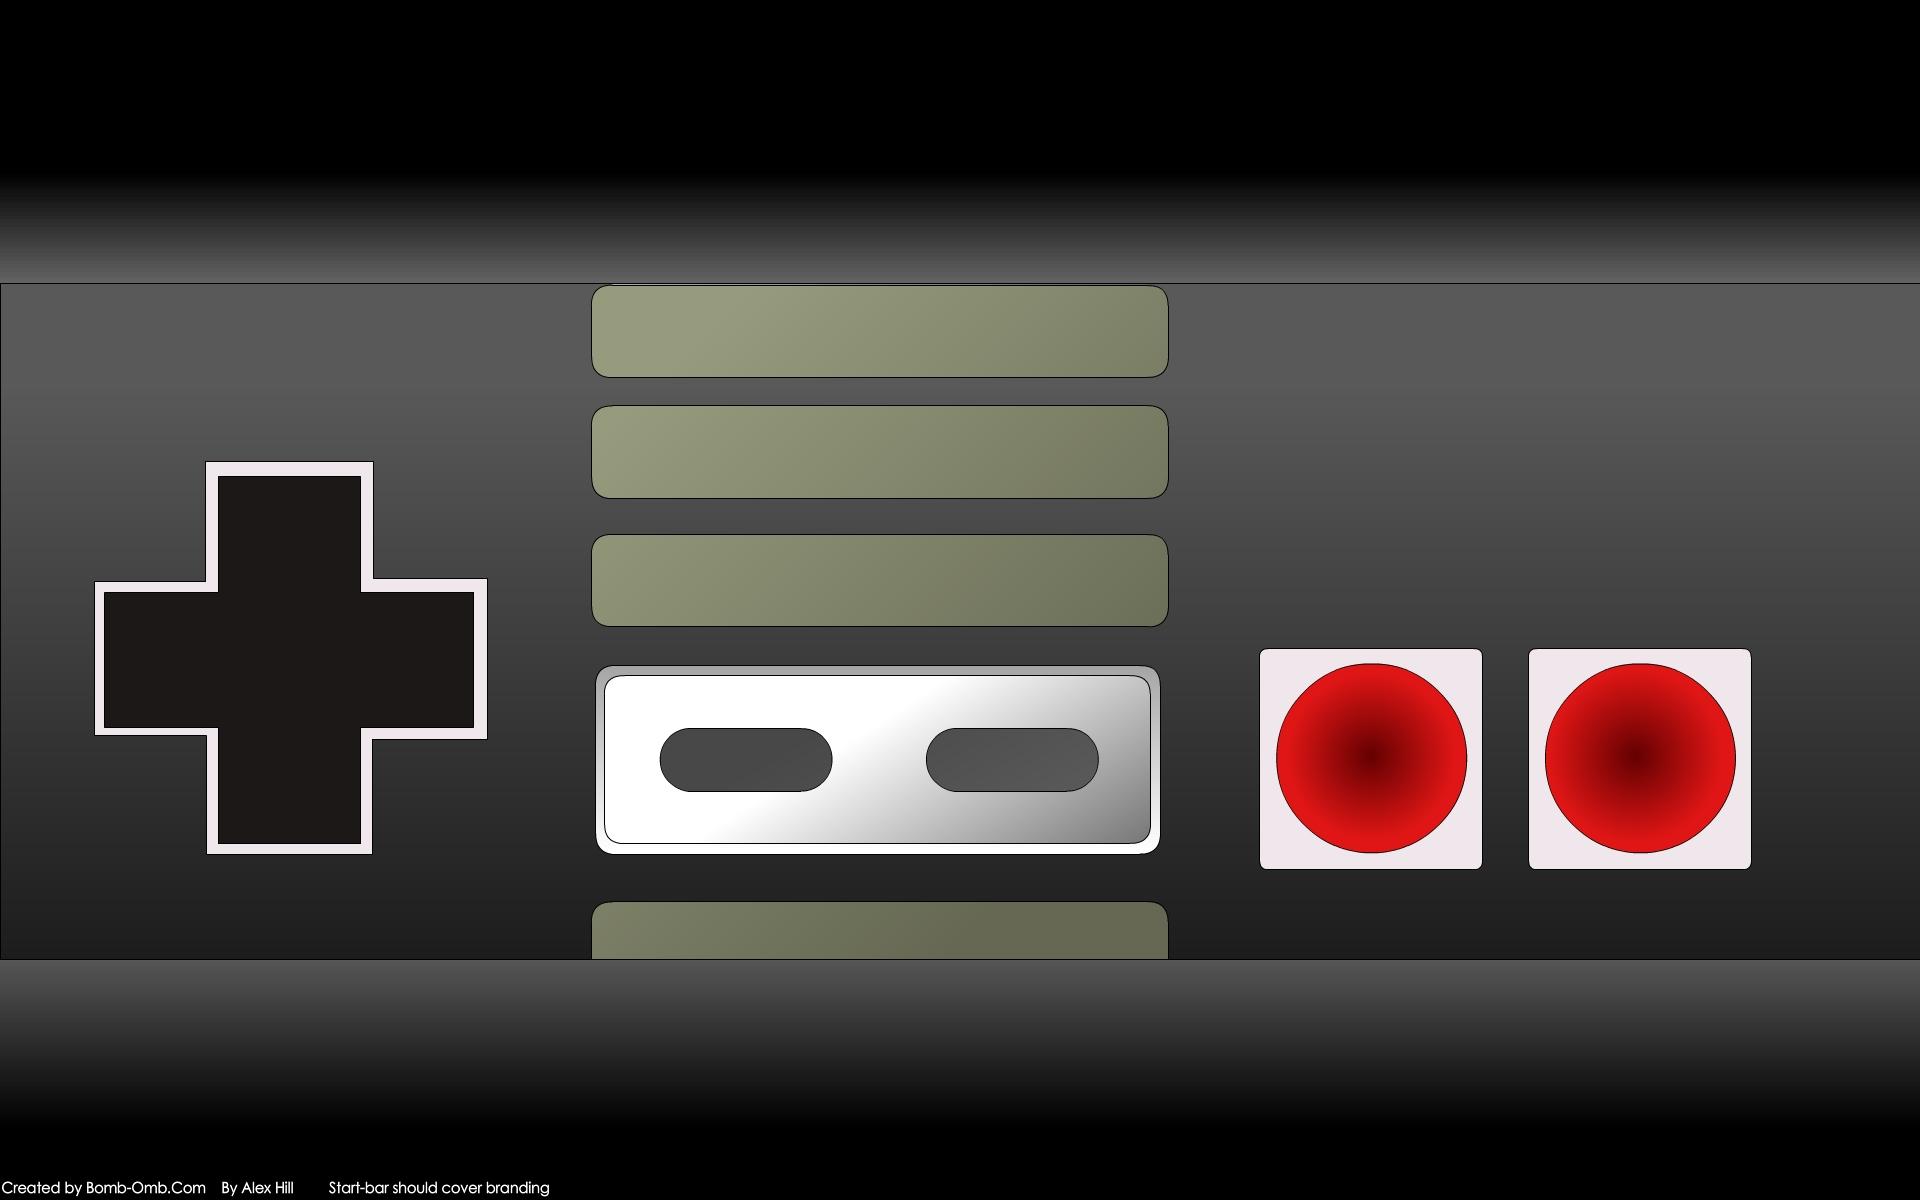 Nintendo Nes Wallpaper 1920x1200 Nintendo Nes Game Console 1920x1200